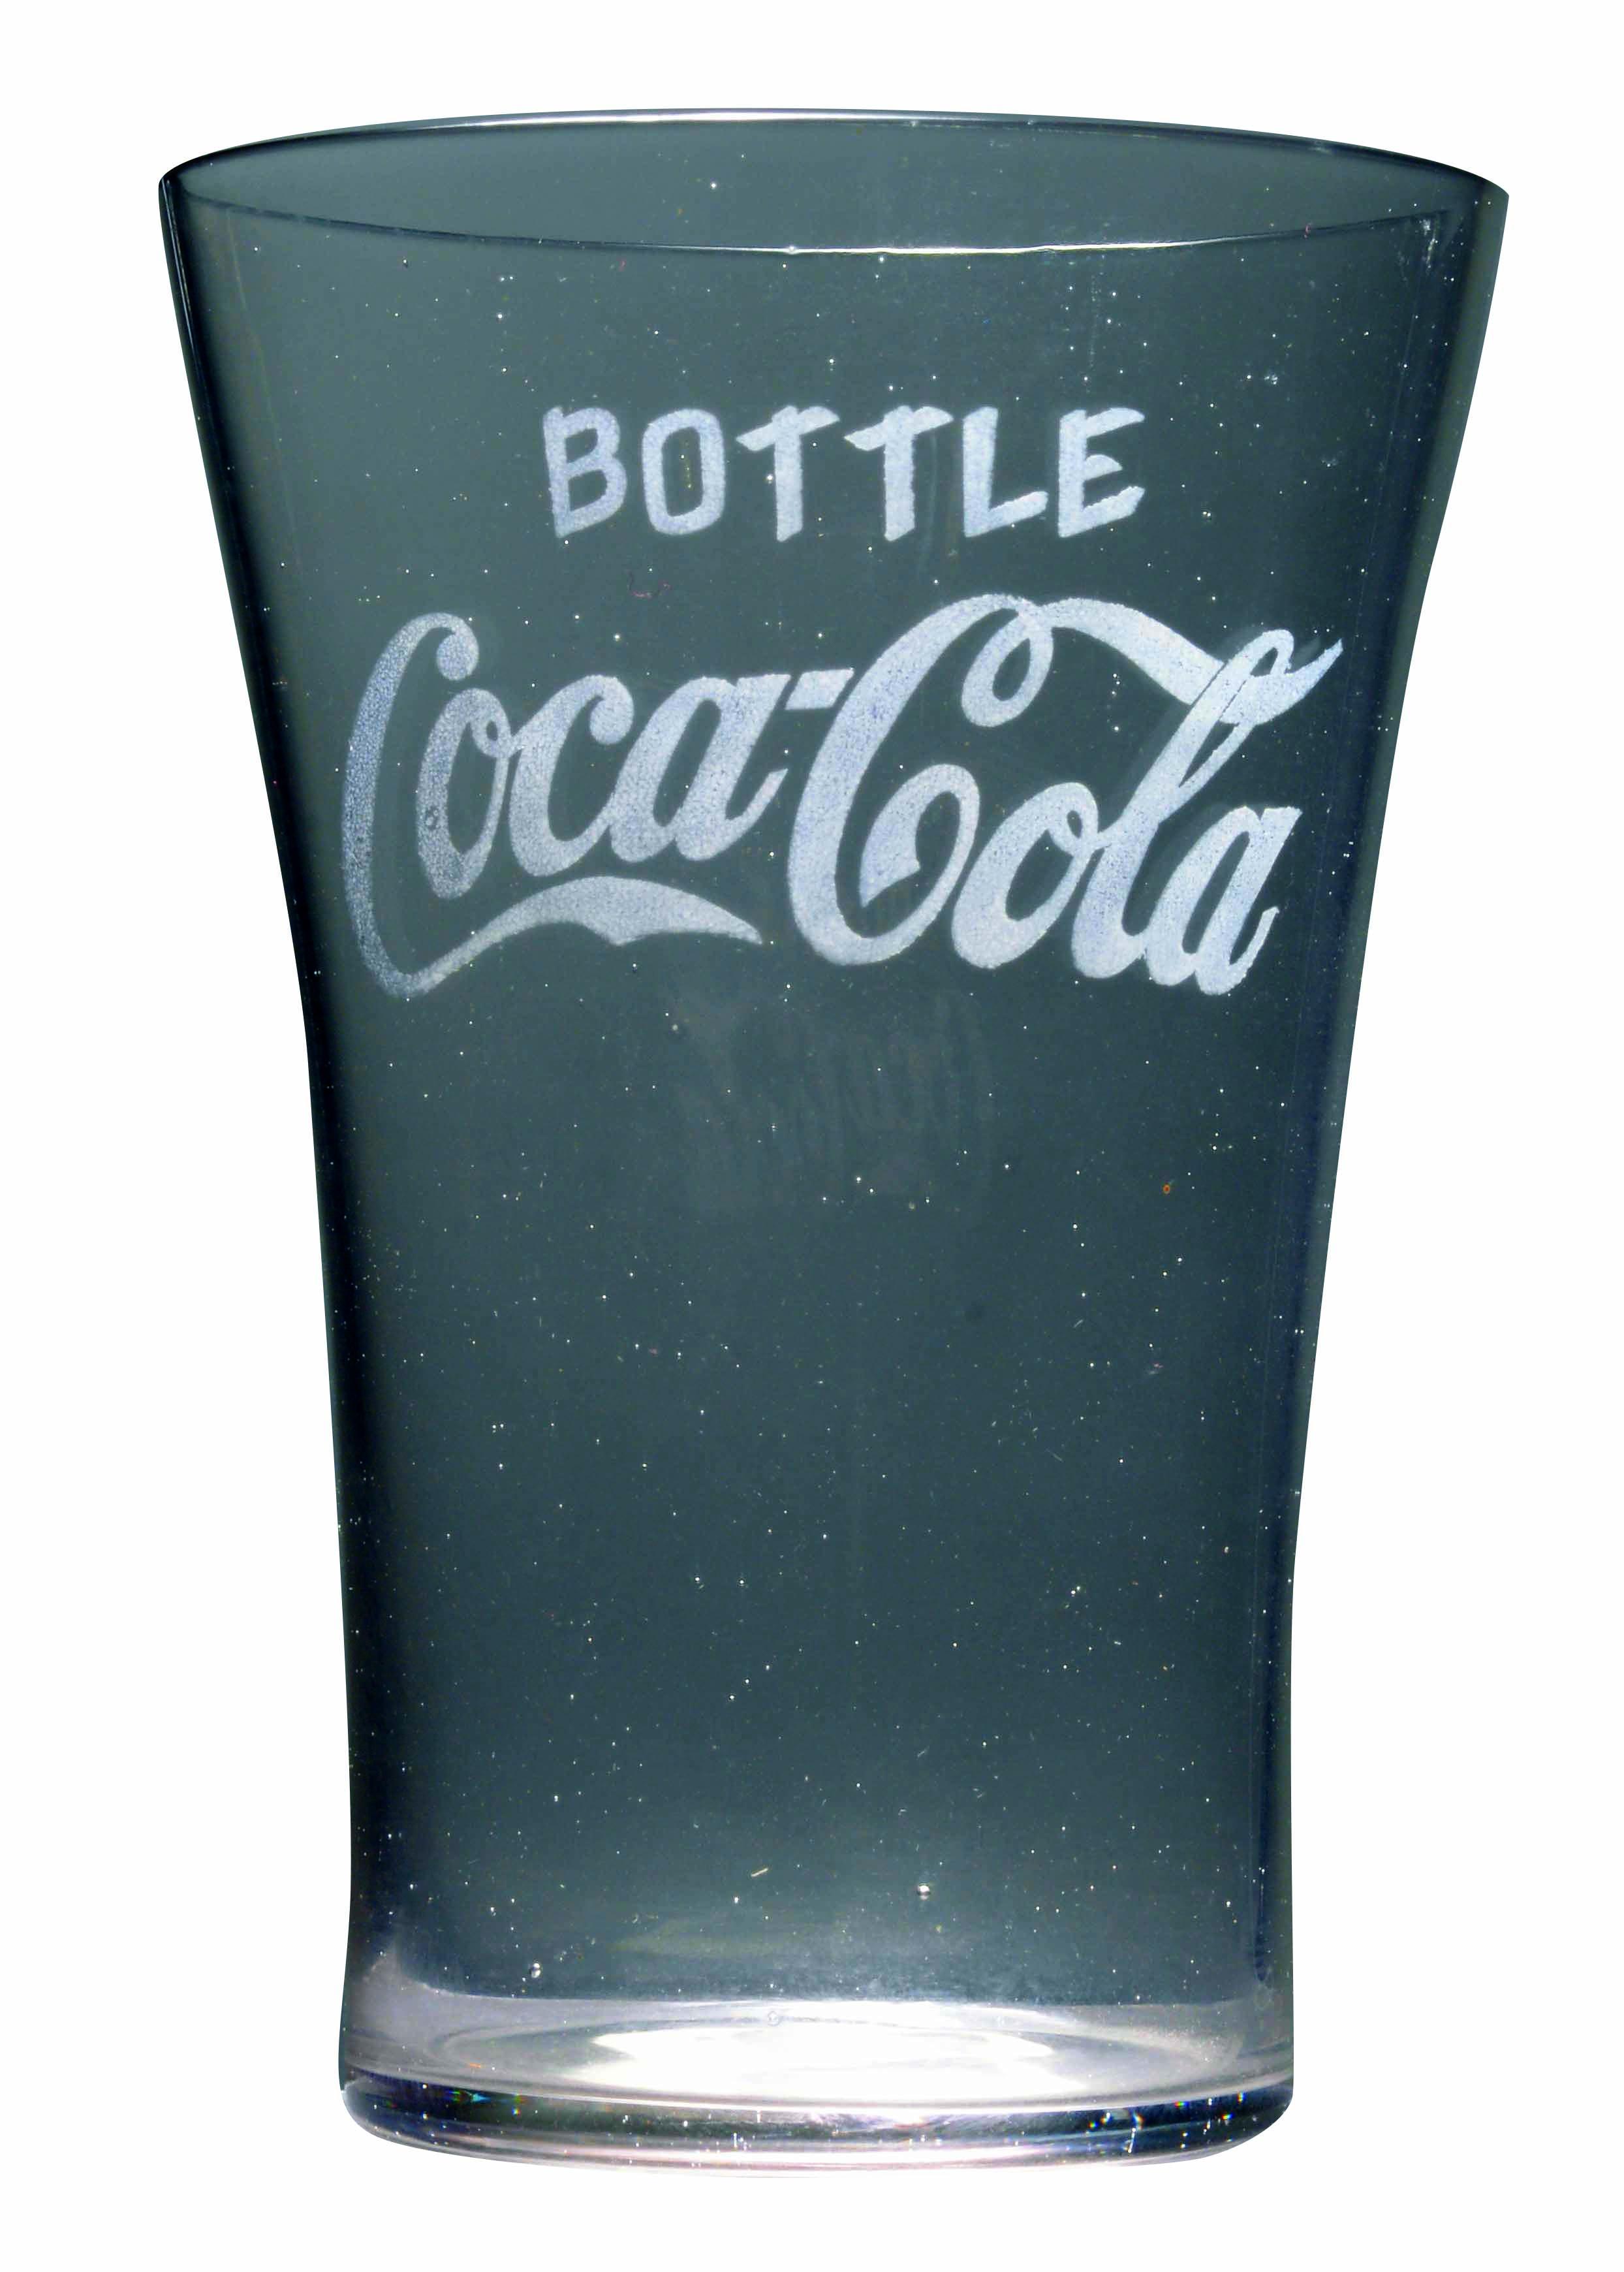 Circa 1916 Coca-Cola